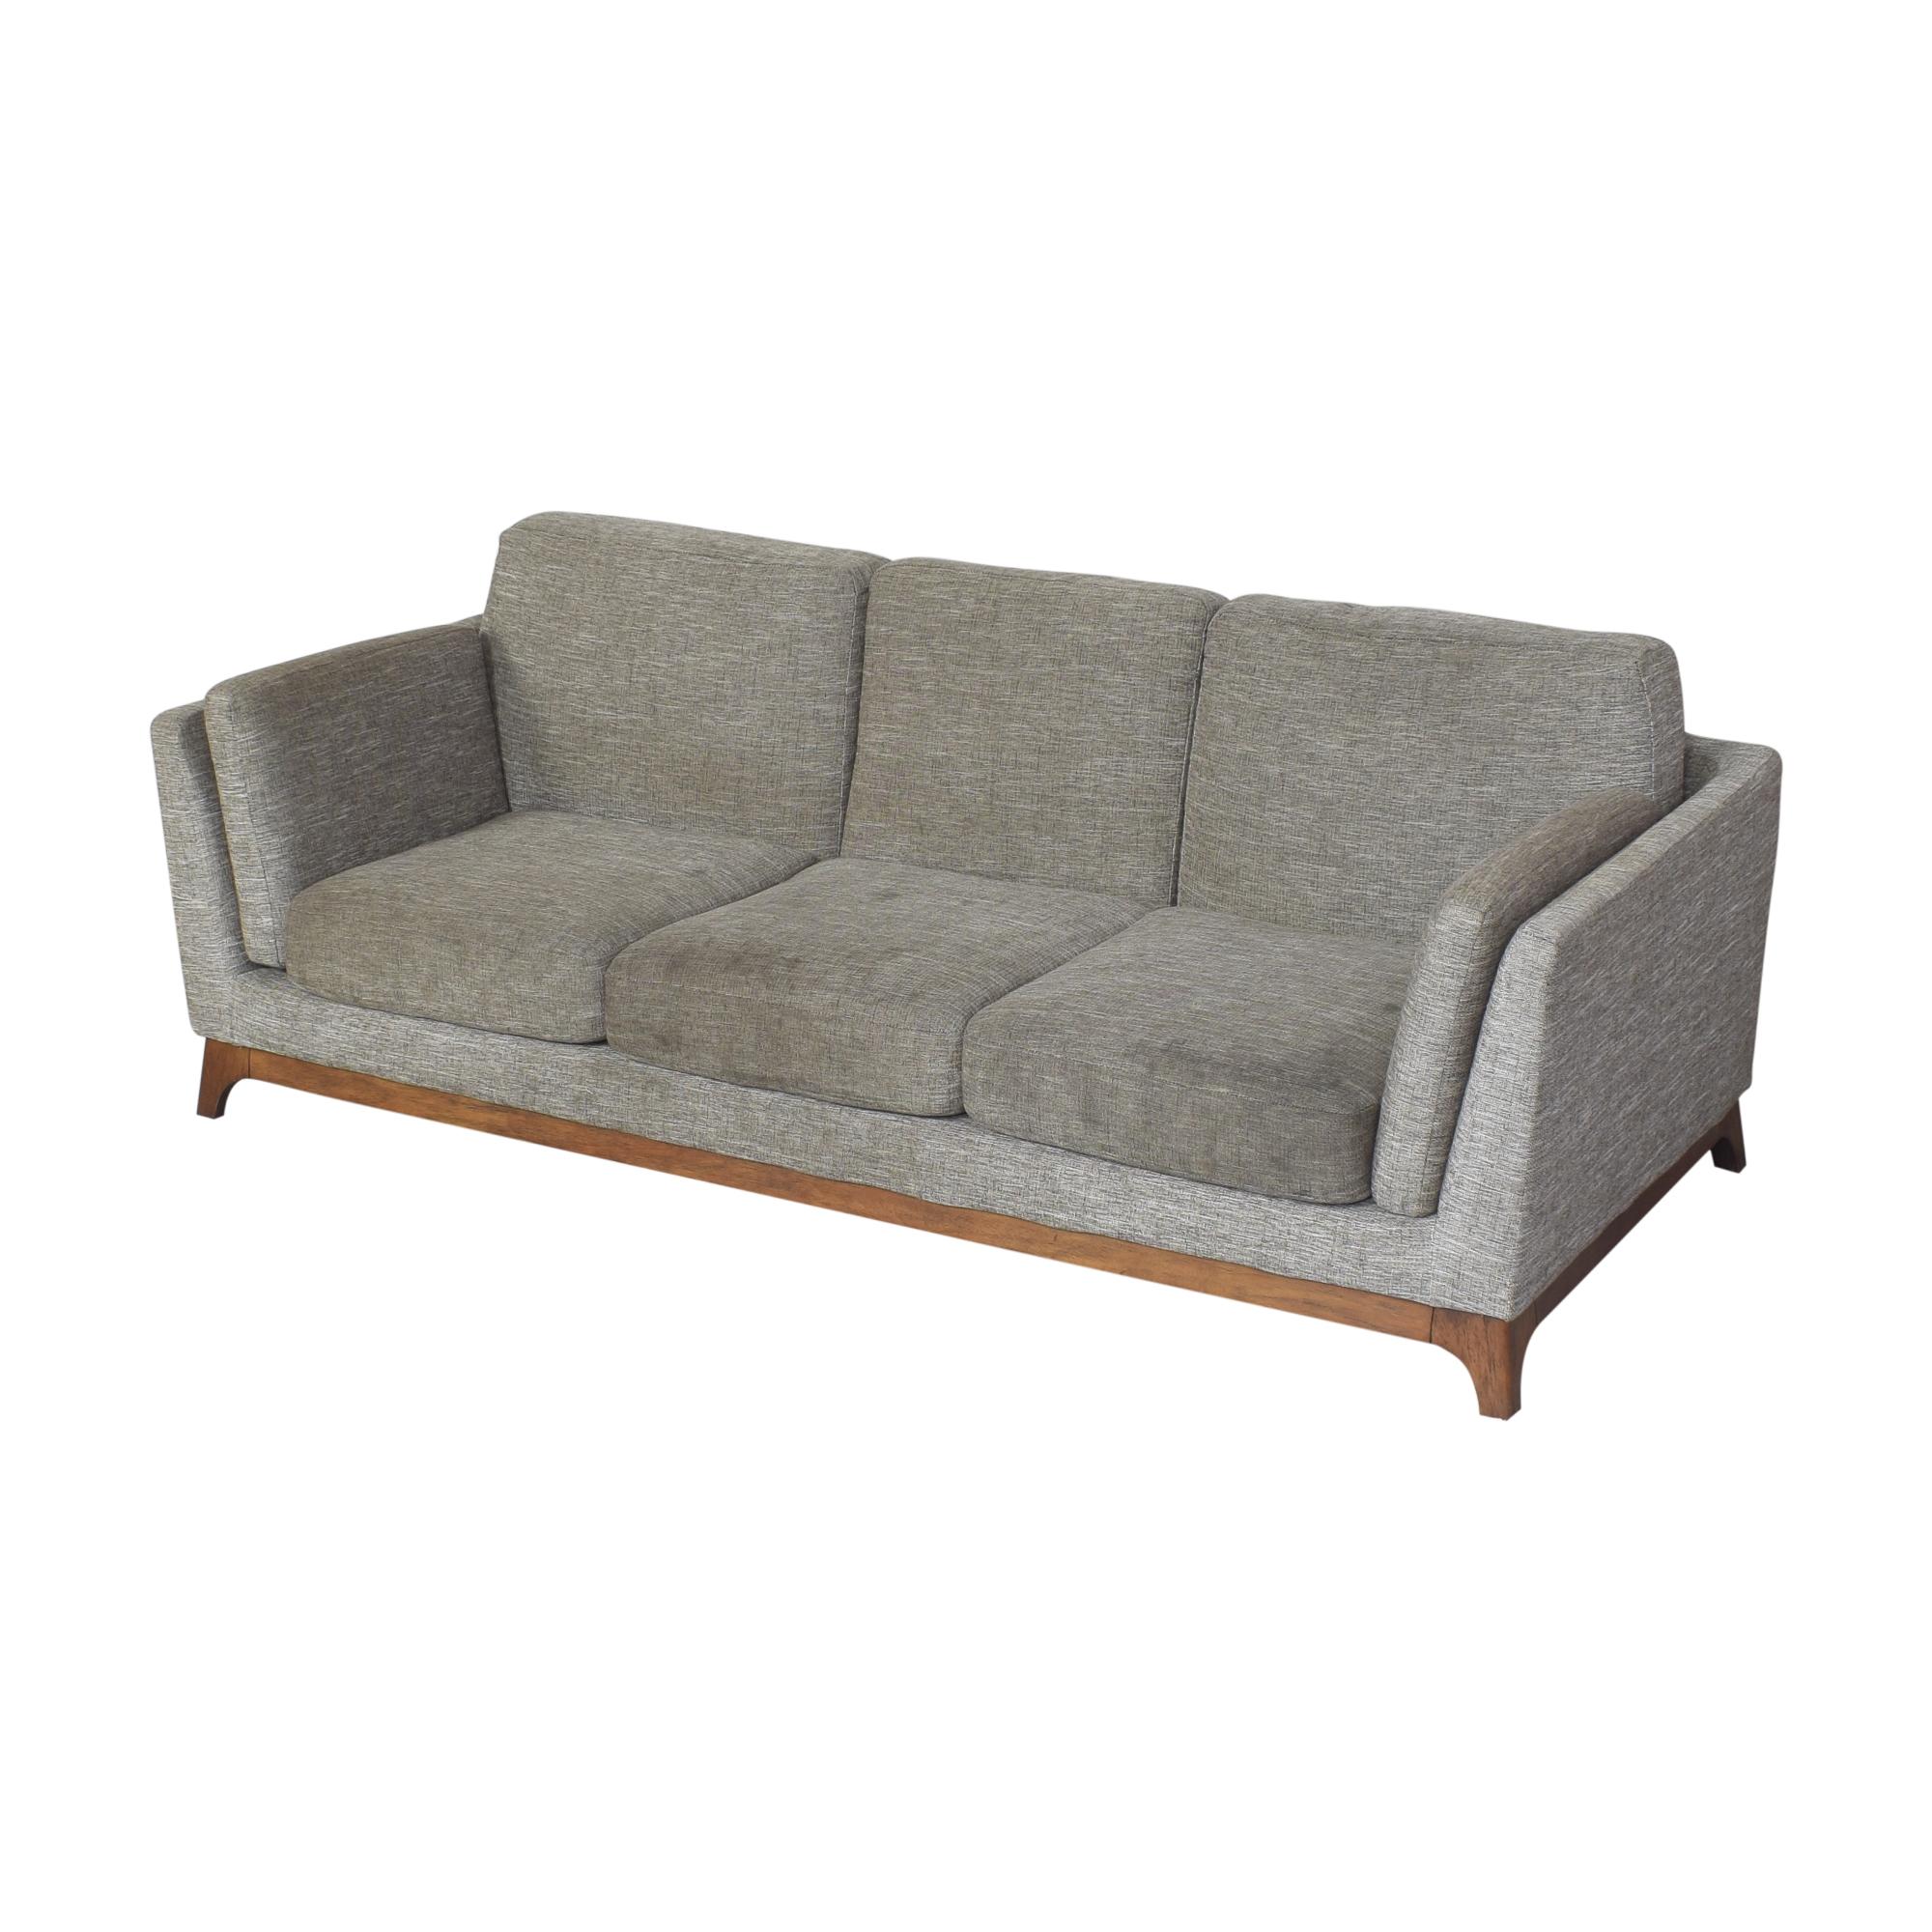 Article Article Ceni Three Cushion Sofa dimensions